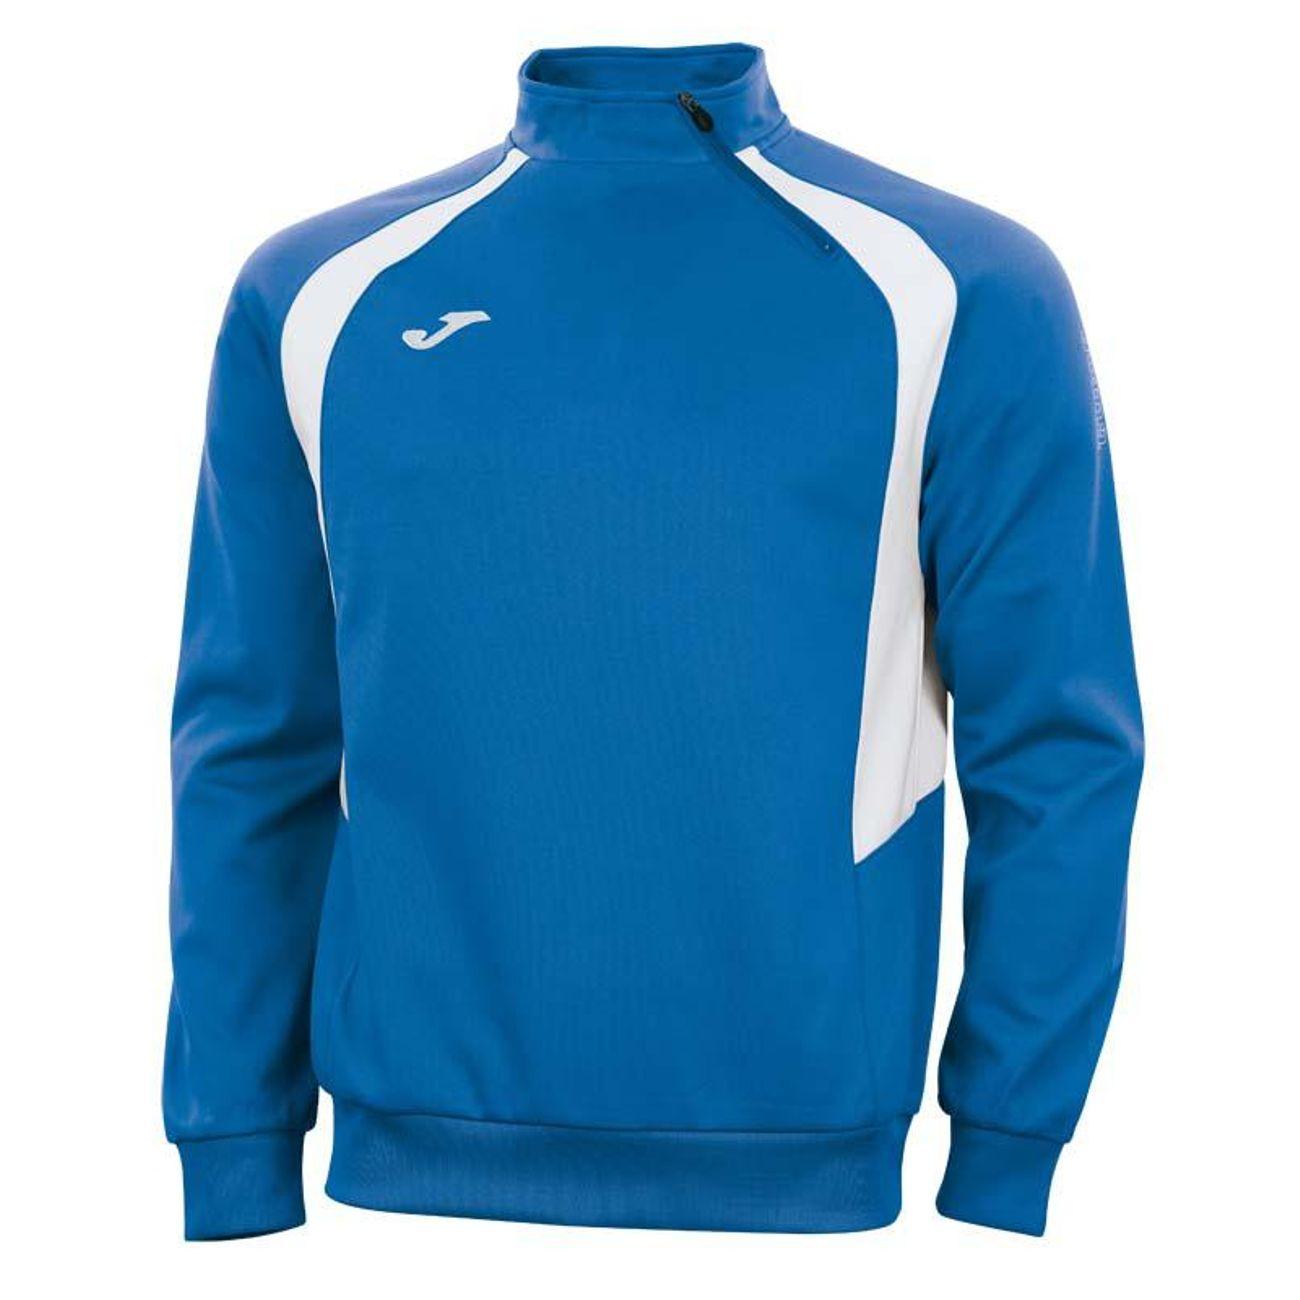 Iii Homme Champion Fitness Sweatshirt Cxdoeb Joma 8nPym0vONw